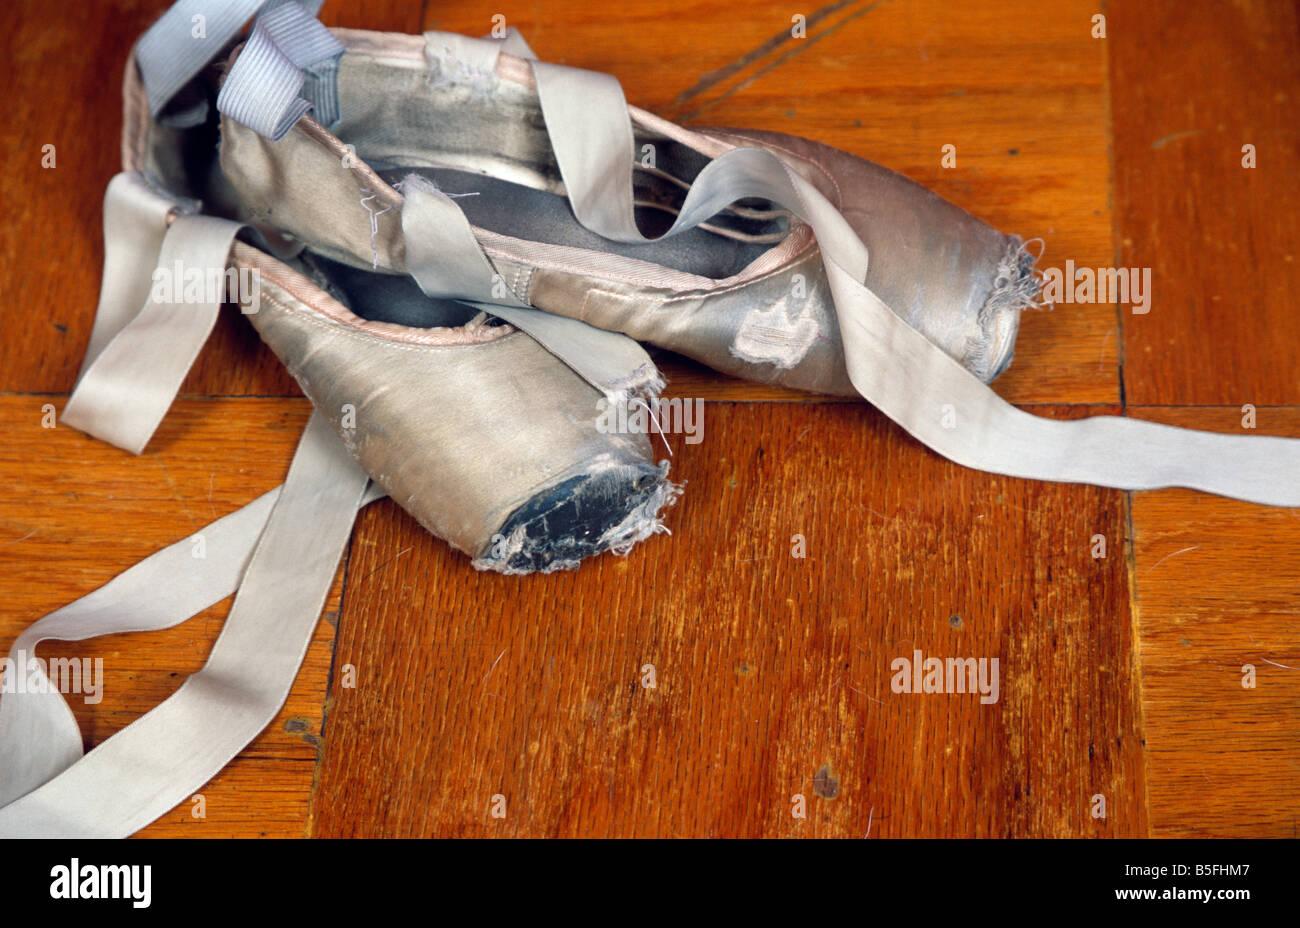 ballet point shoes on dance studio floor - Stock Image